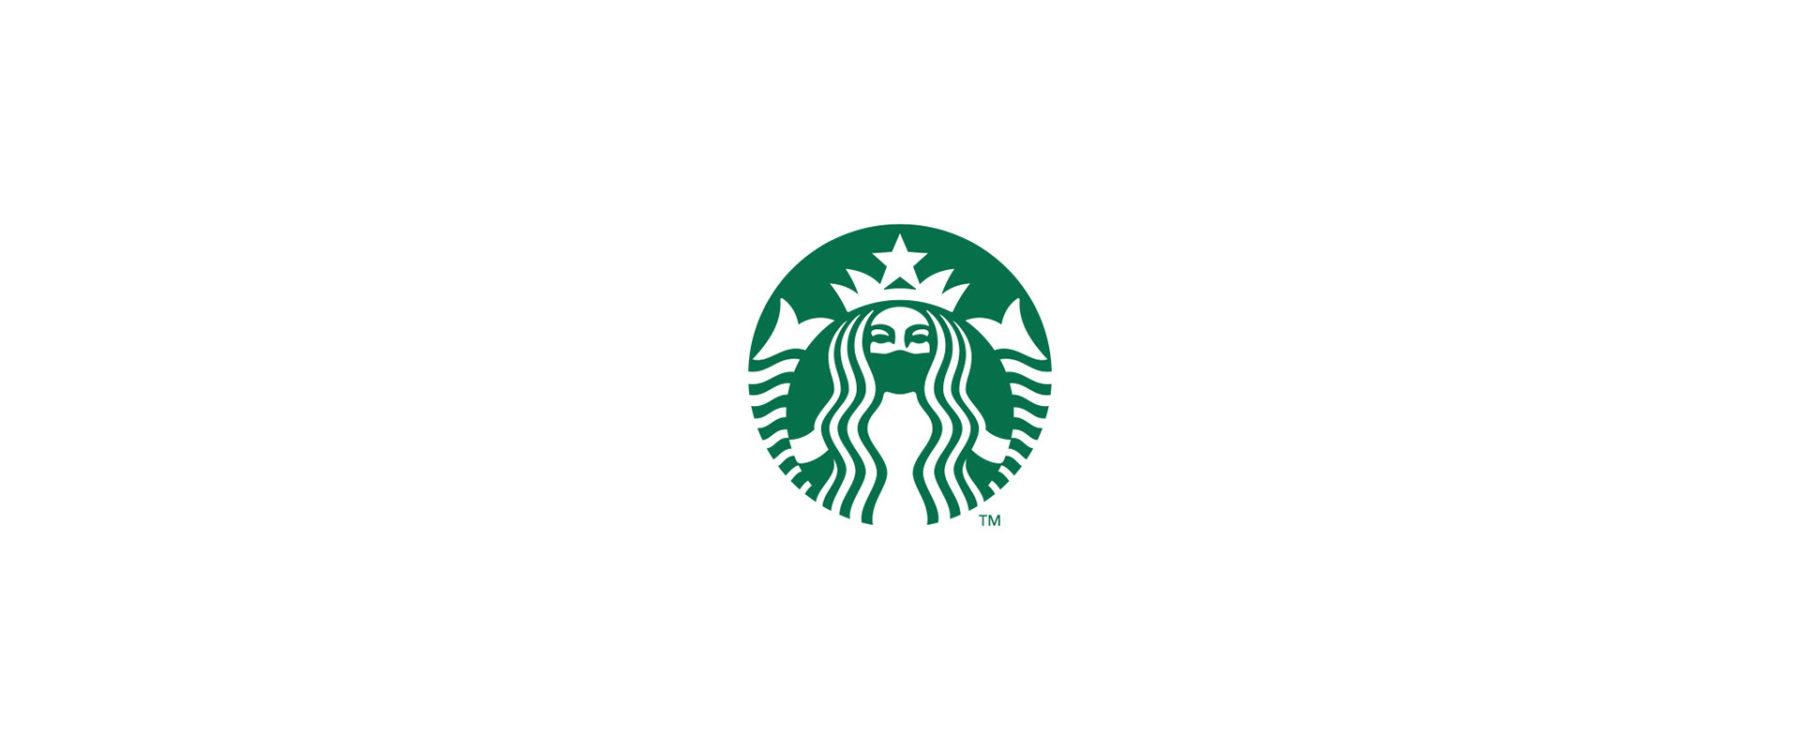 corona virus logos 2